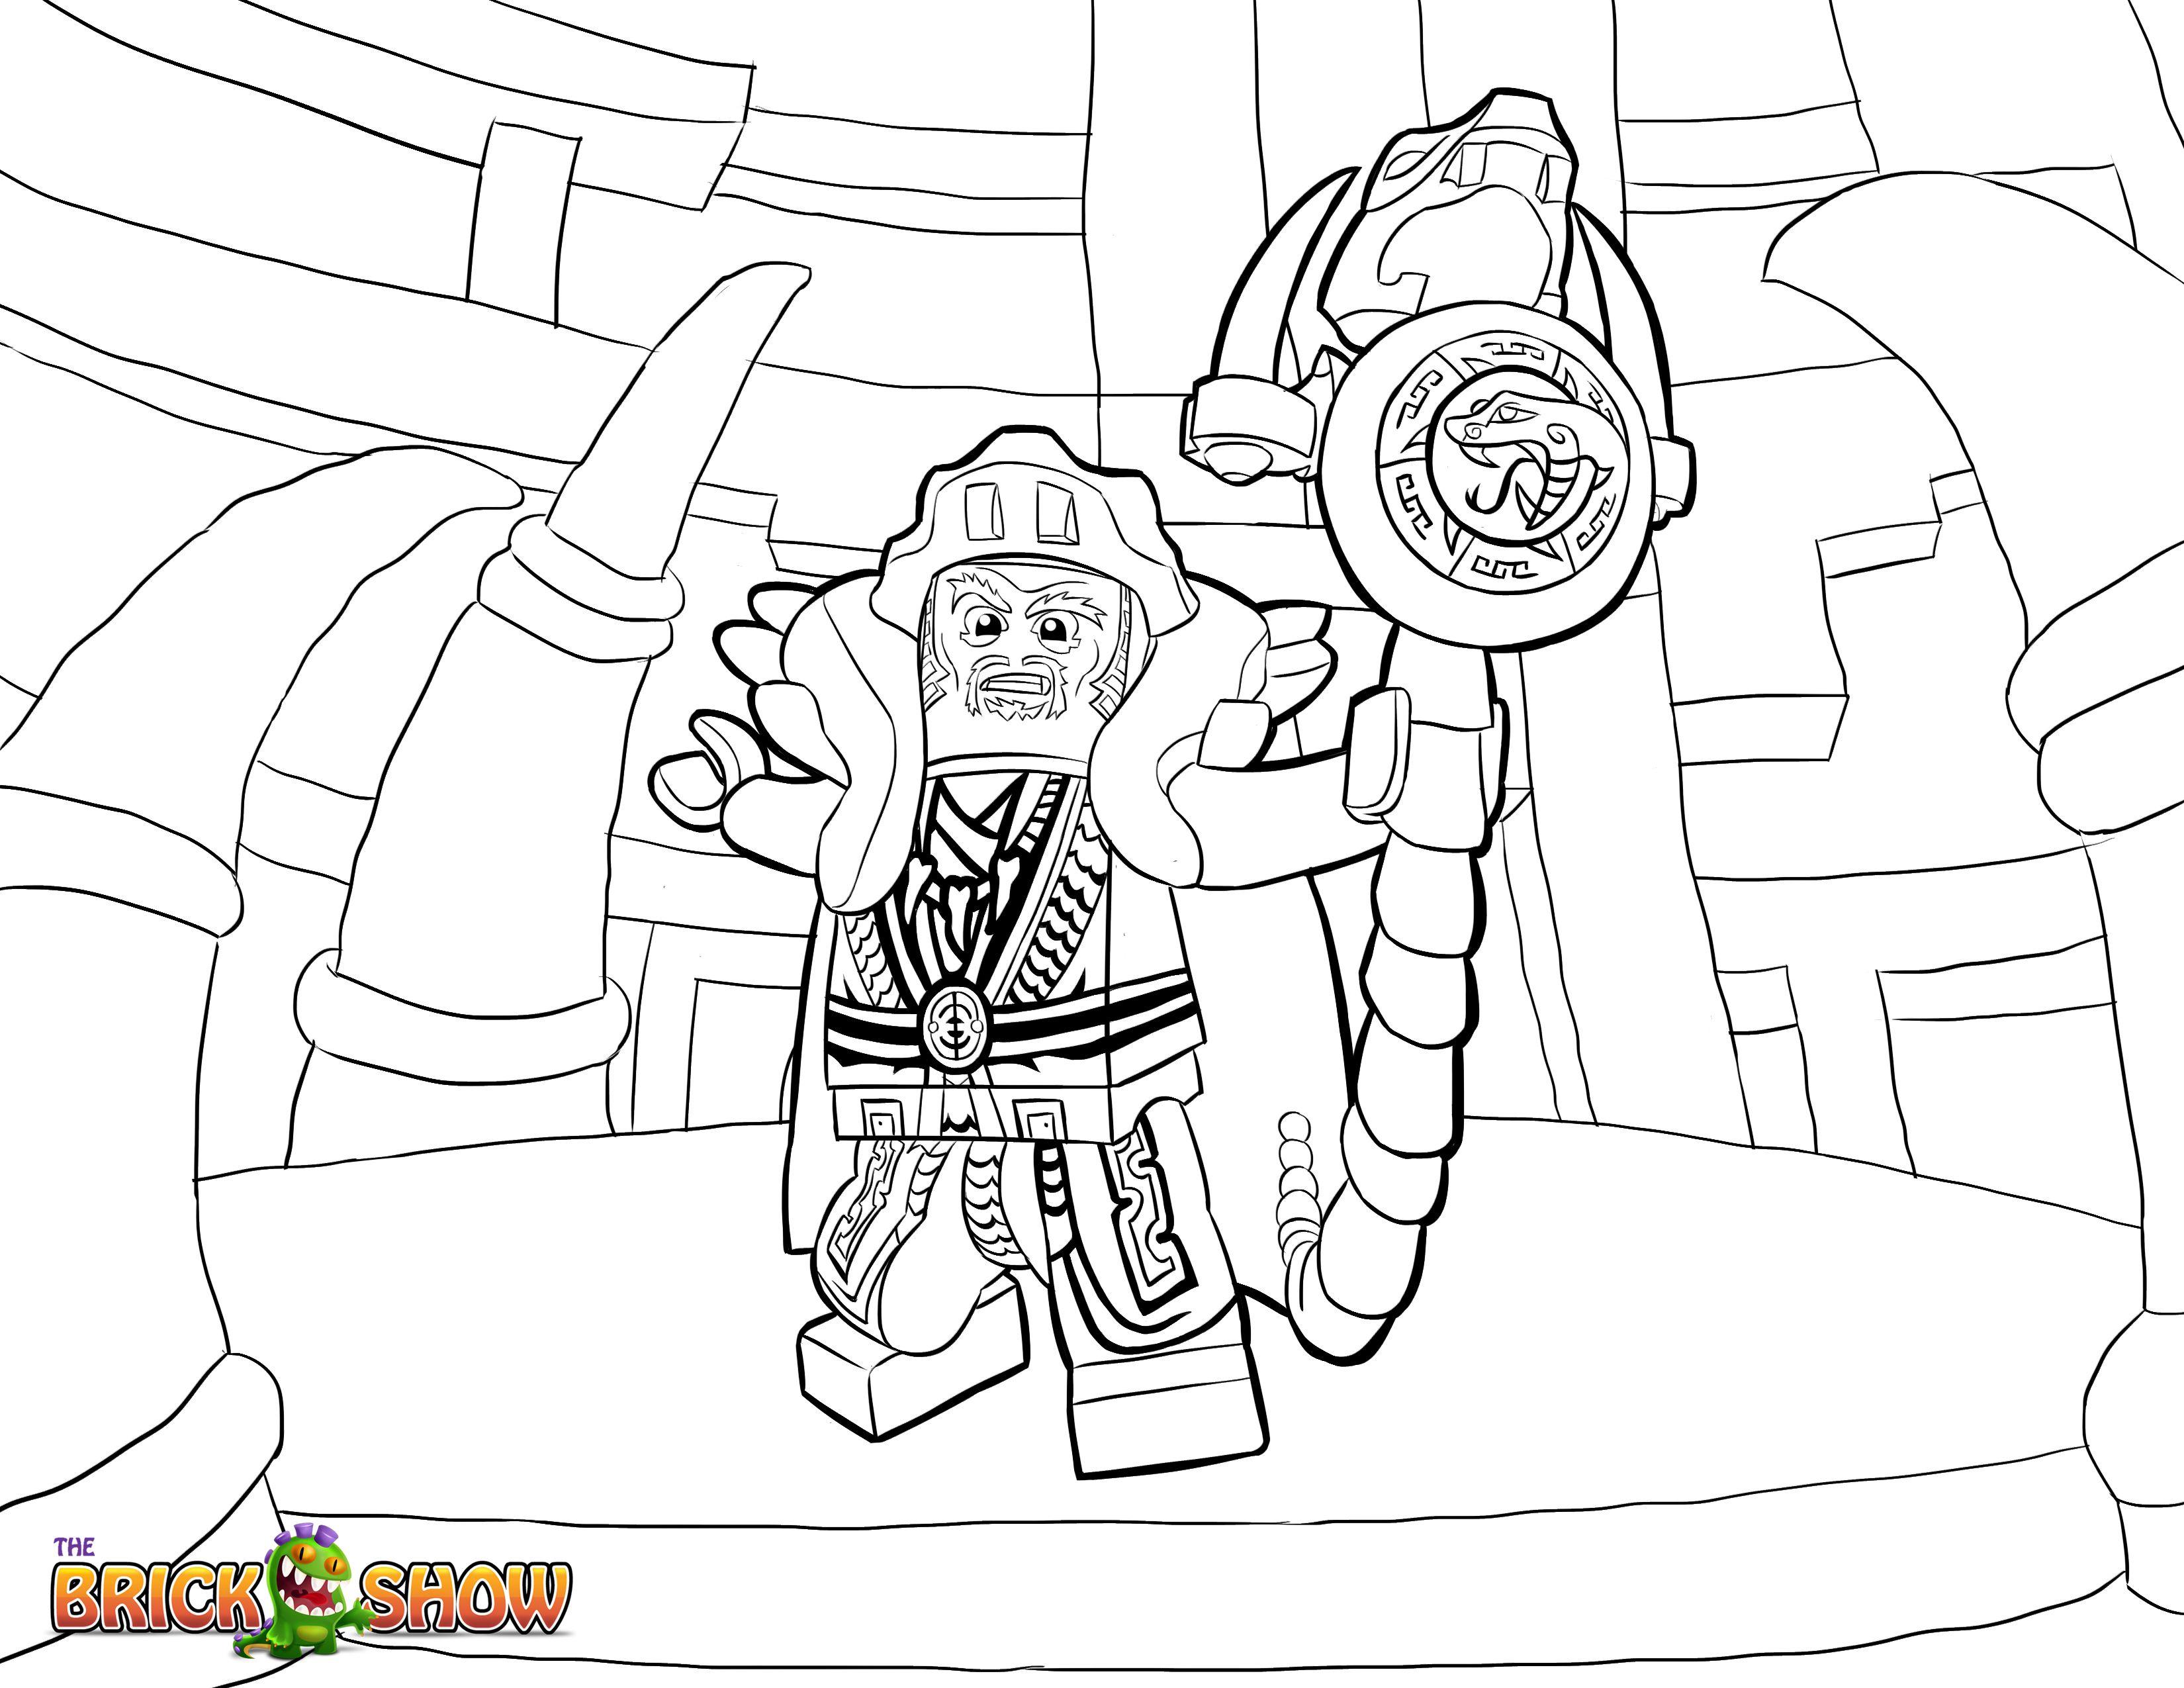 Lego Ninjago Coloring Page Lego Lego Ninjago Master Chen Printable Color Sheet